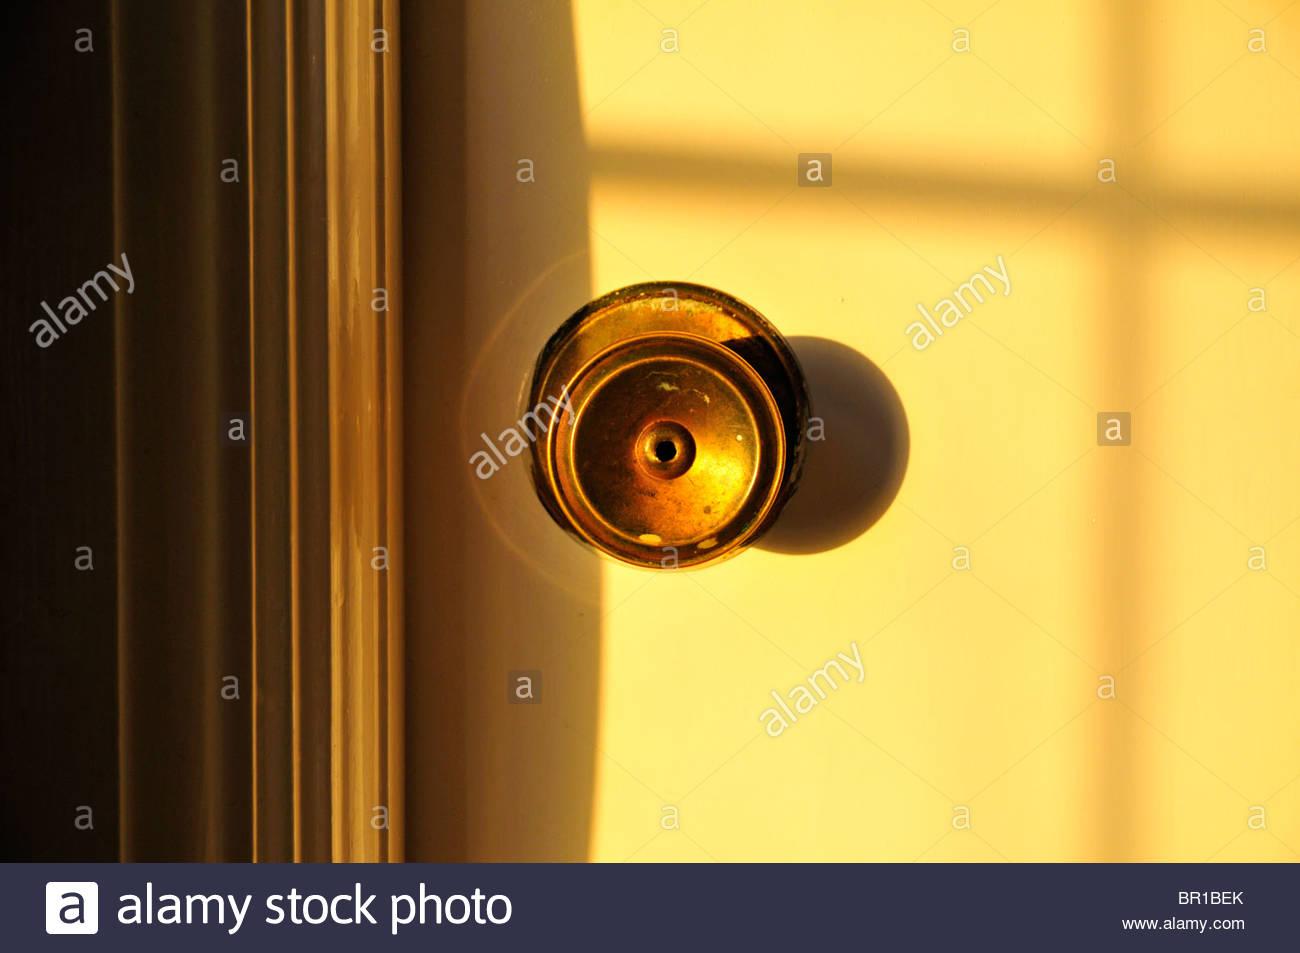 round brass door knob with key lock cast in strong sunlight shadow